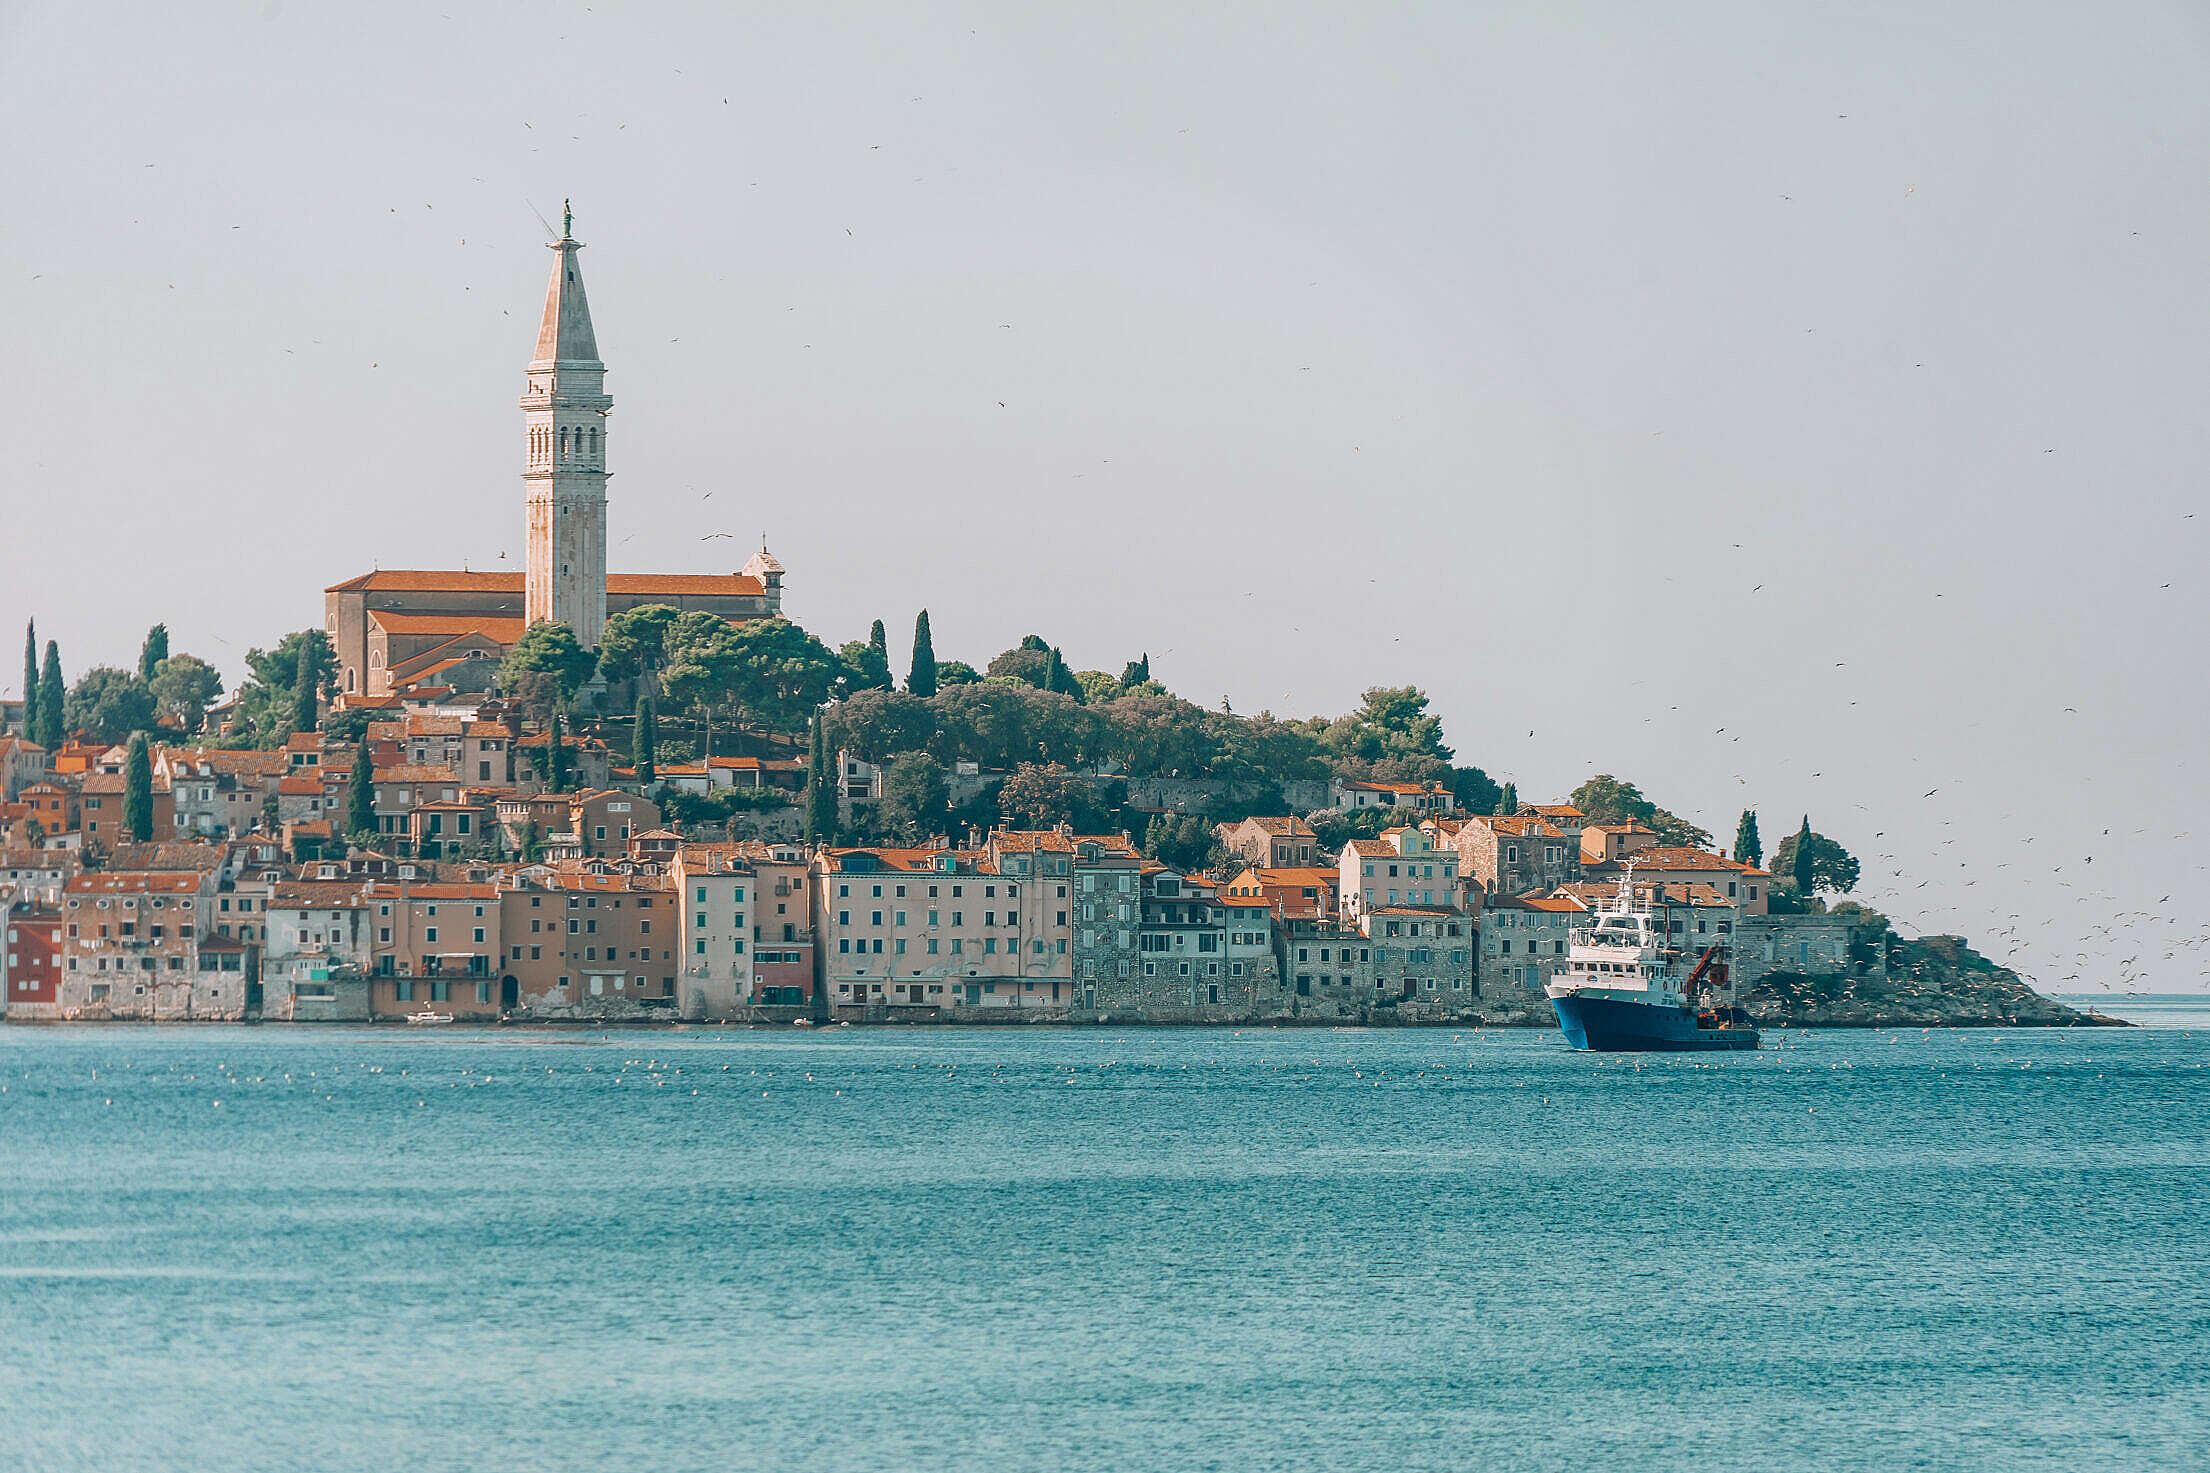 Seagulls Following Fishing Boat near Rovinj Town, Croatia Free Stock Photo